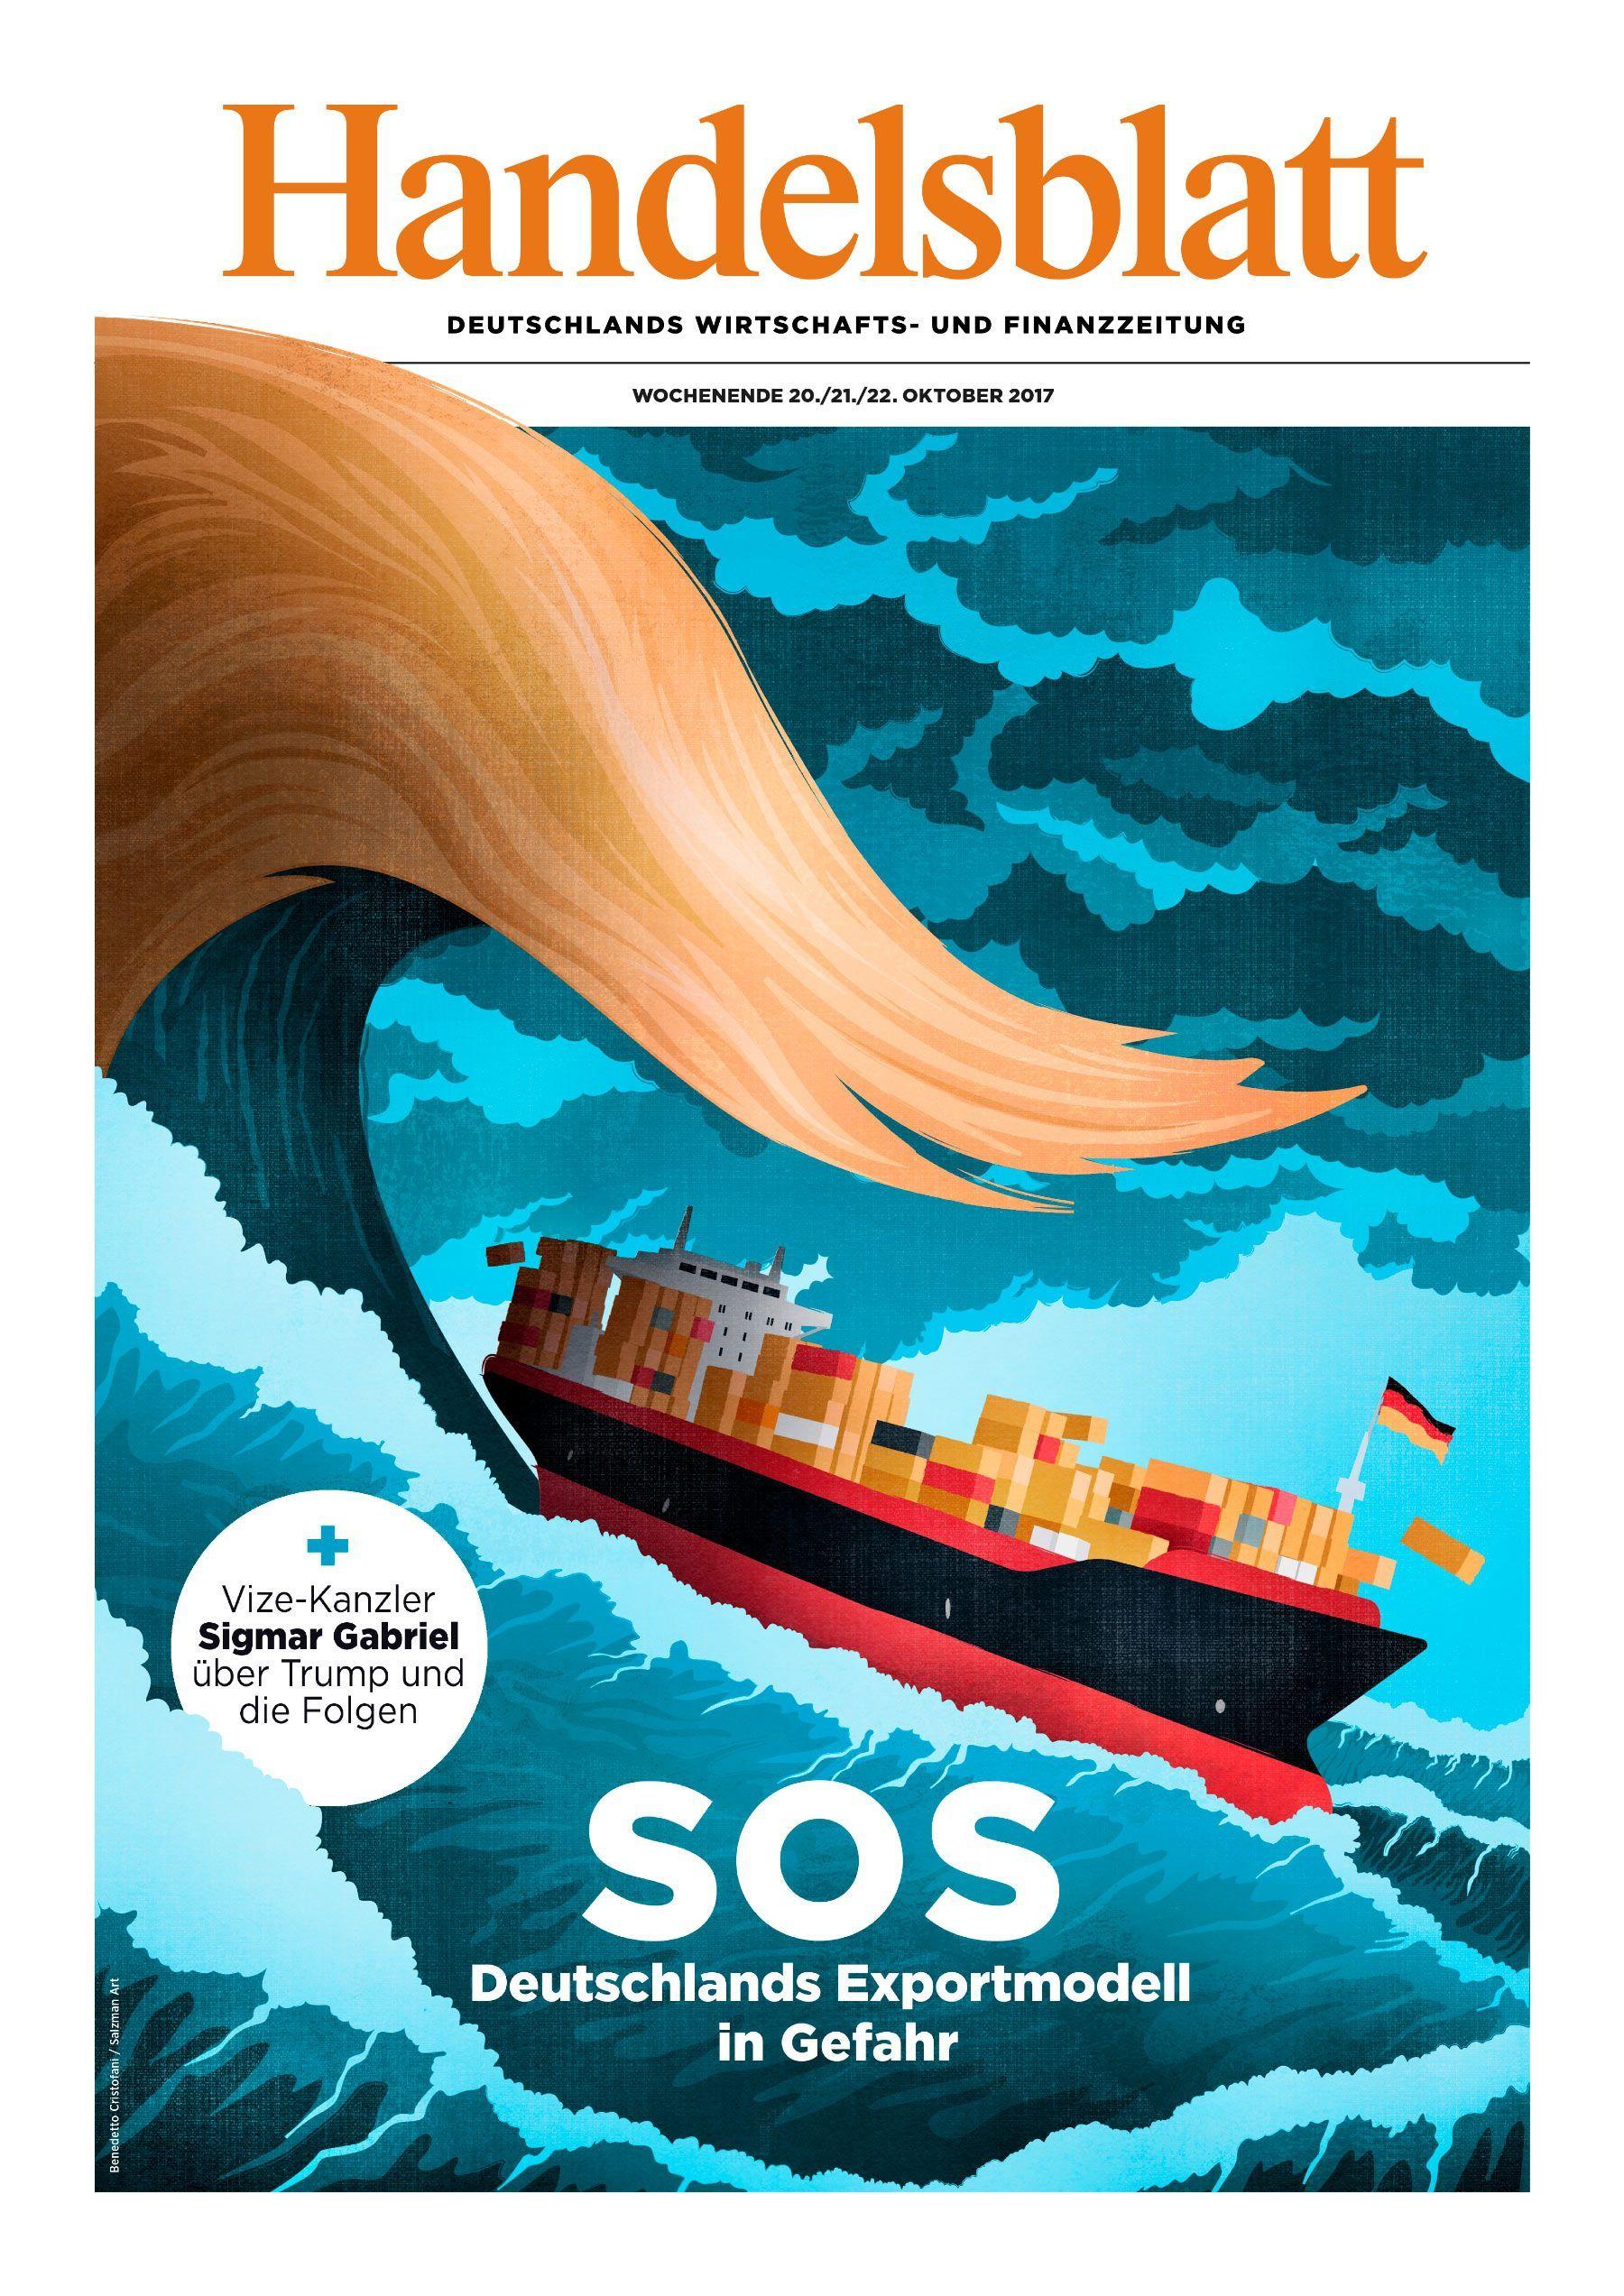 Economic Magazines Benedetto Cristofani S Latest Cover Illustration for German Economic